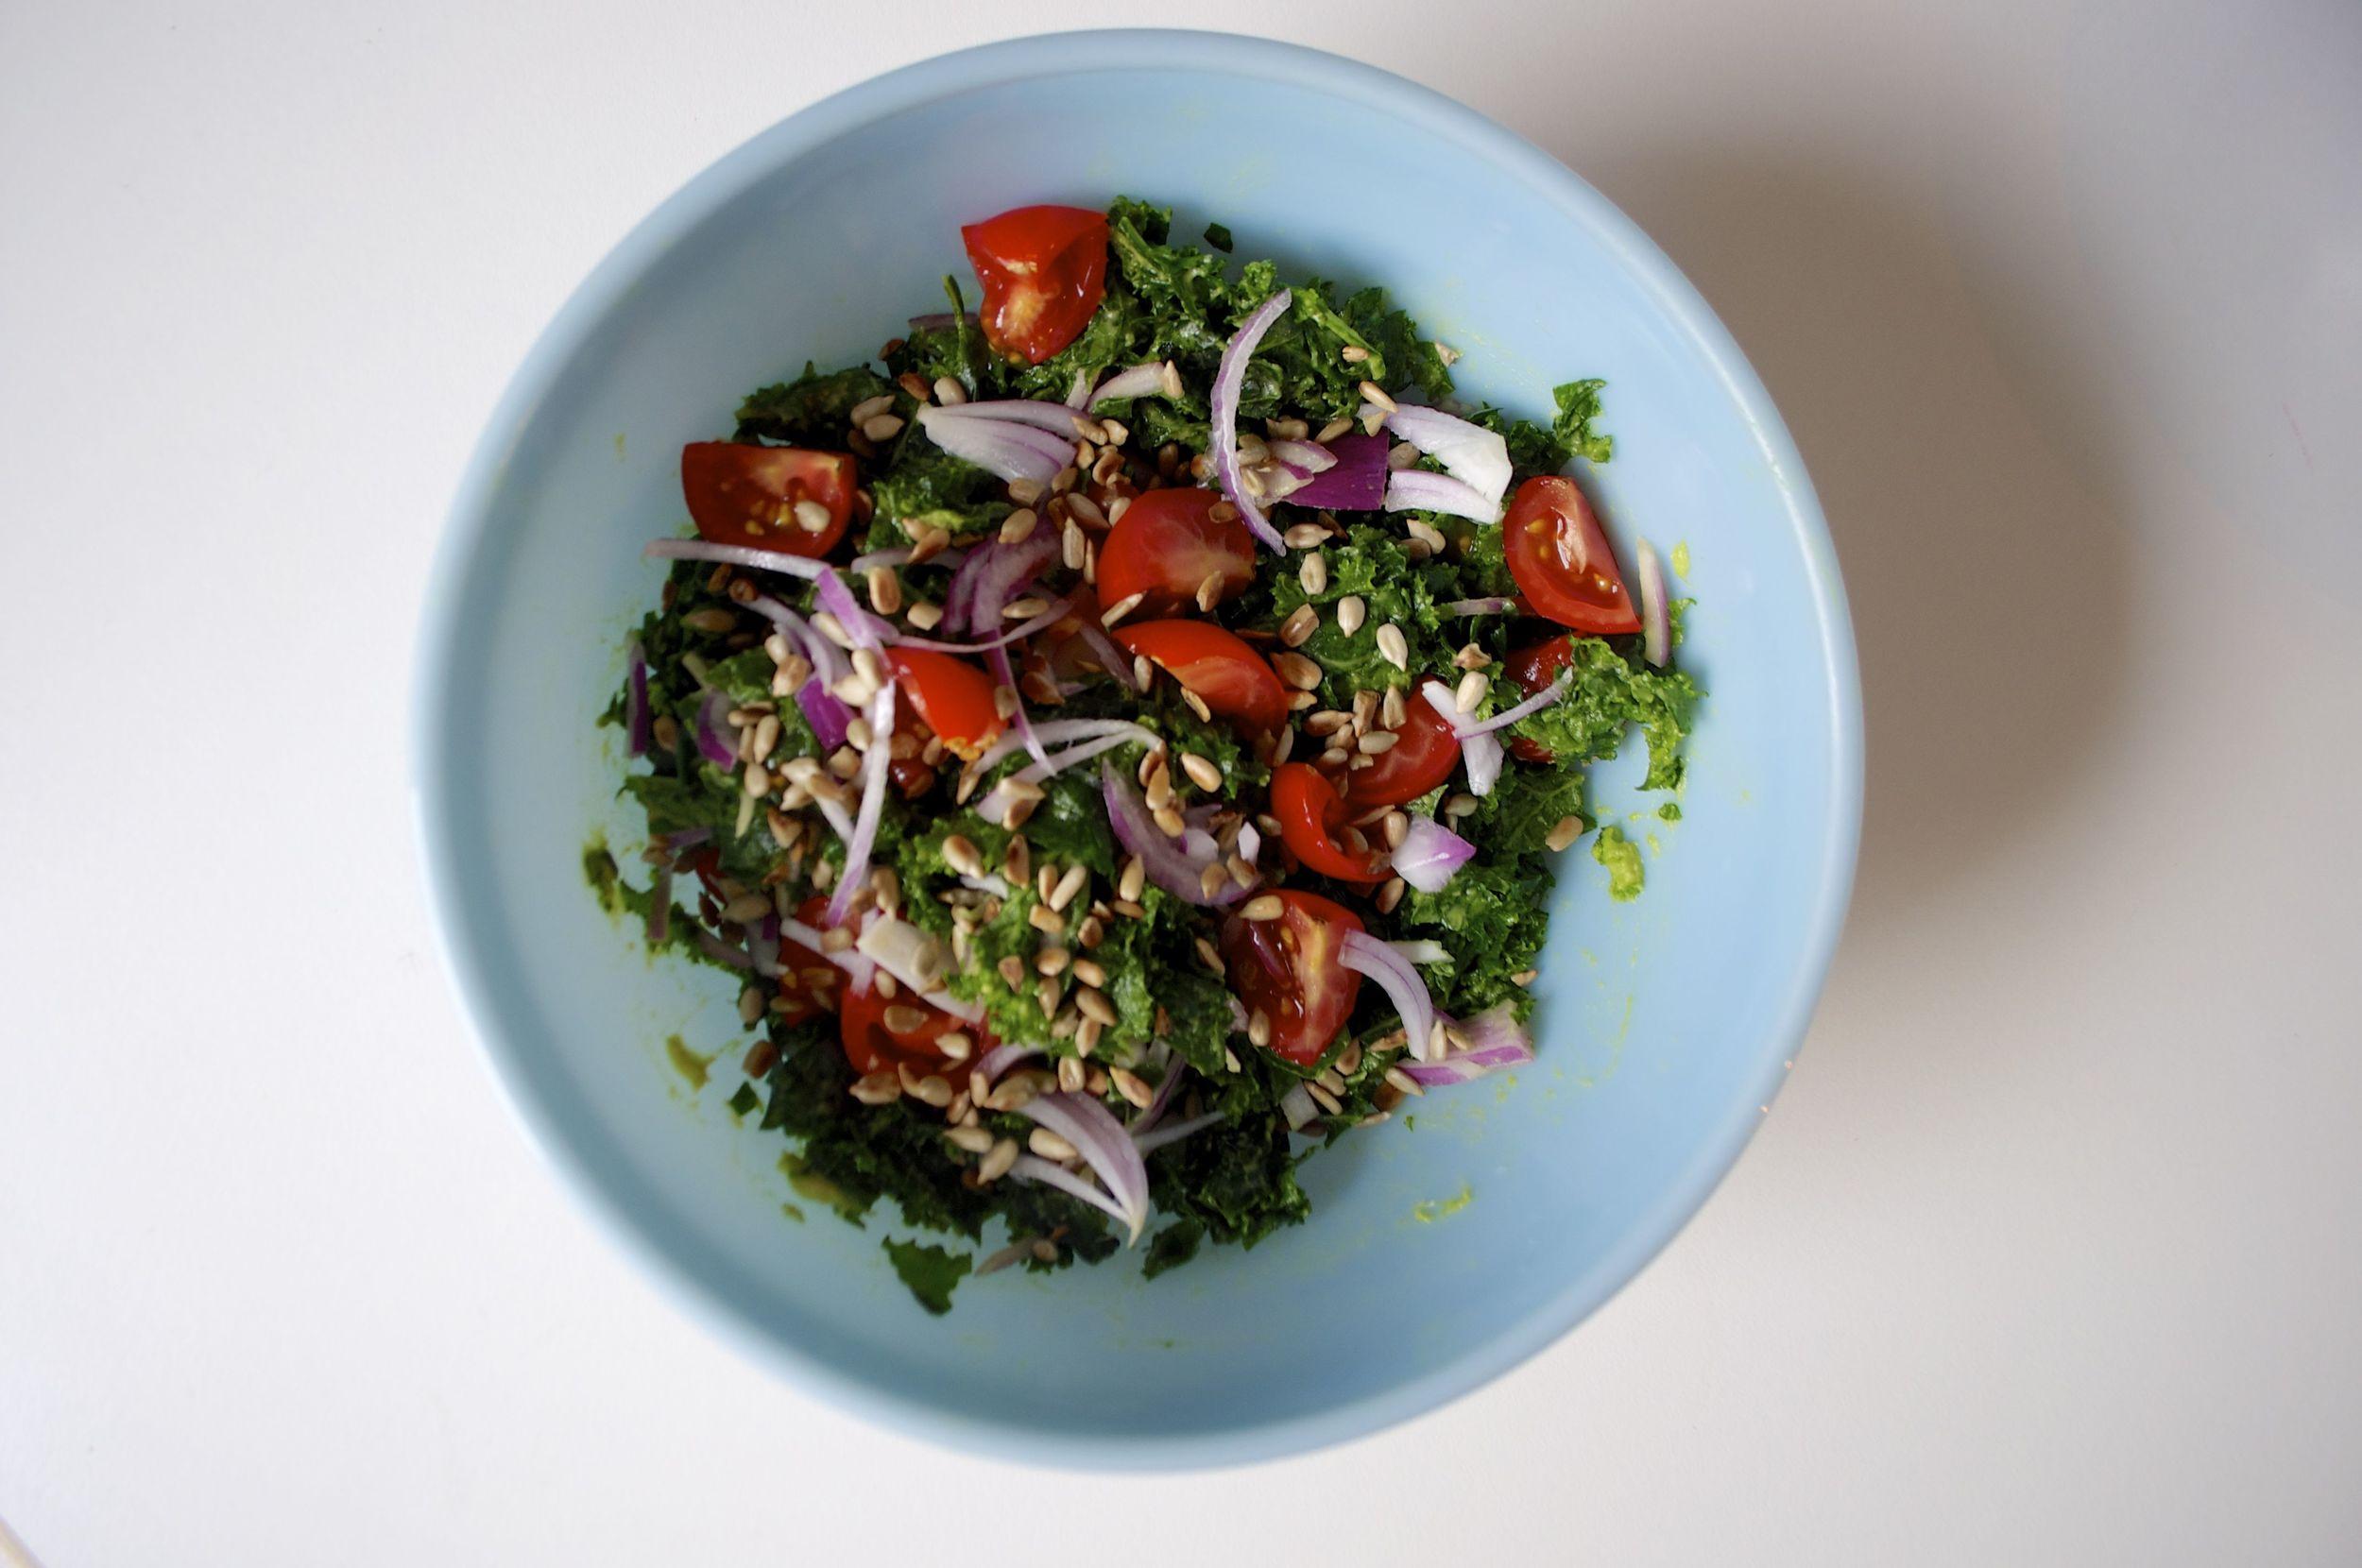 detox-kale-avocado-salad-fried-parsley